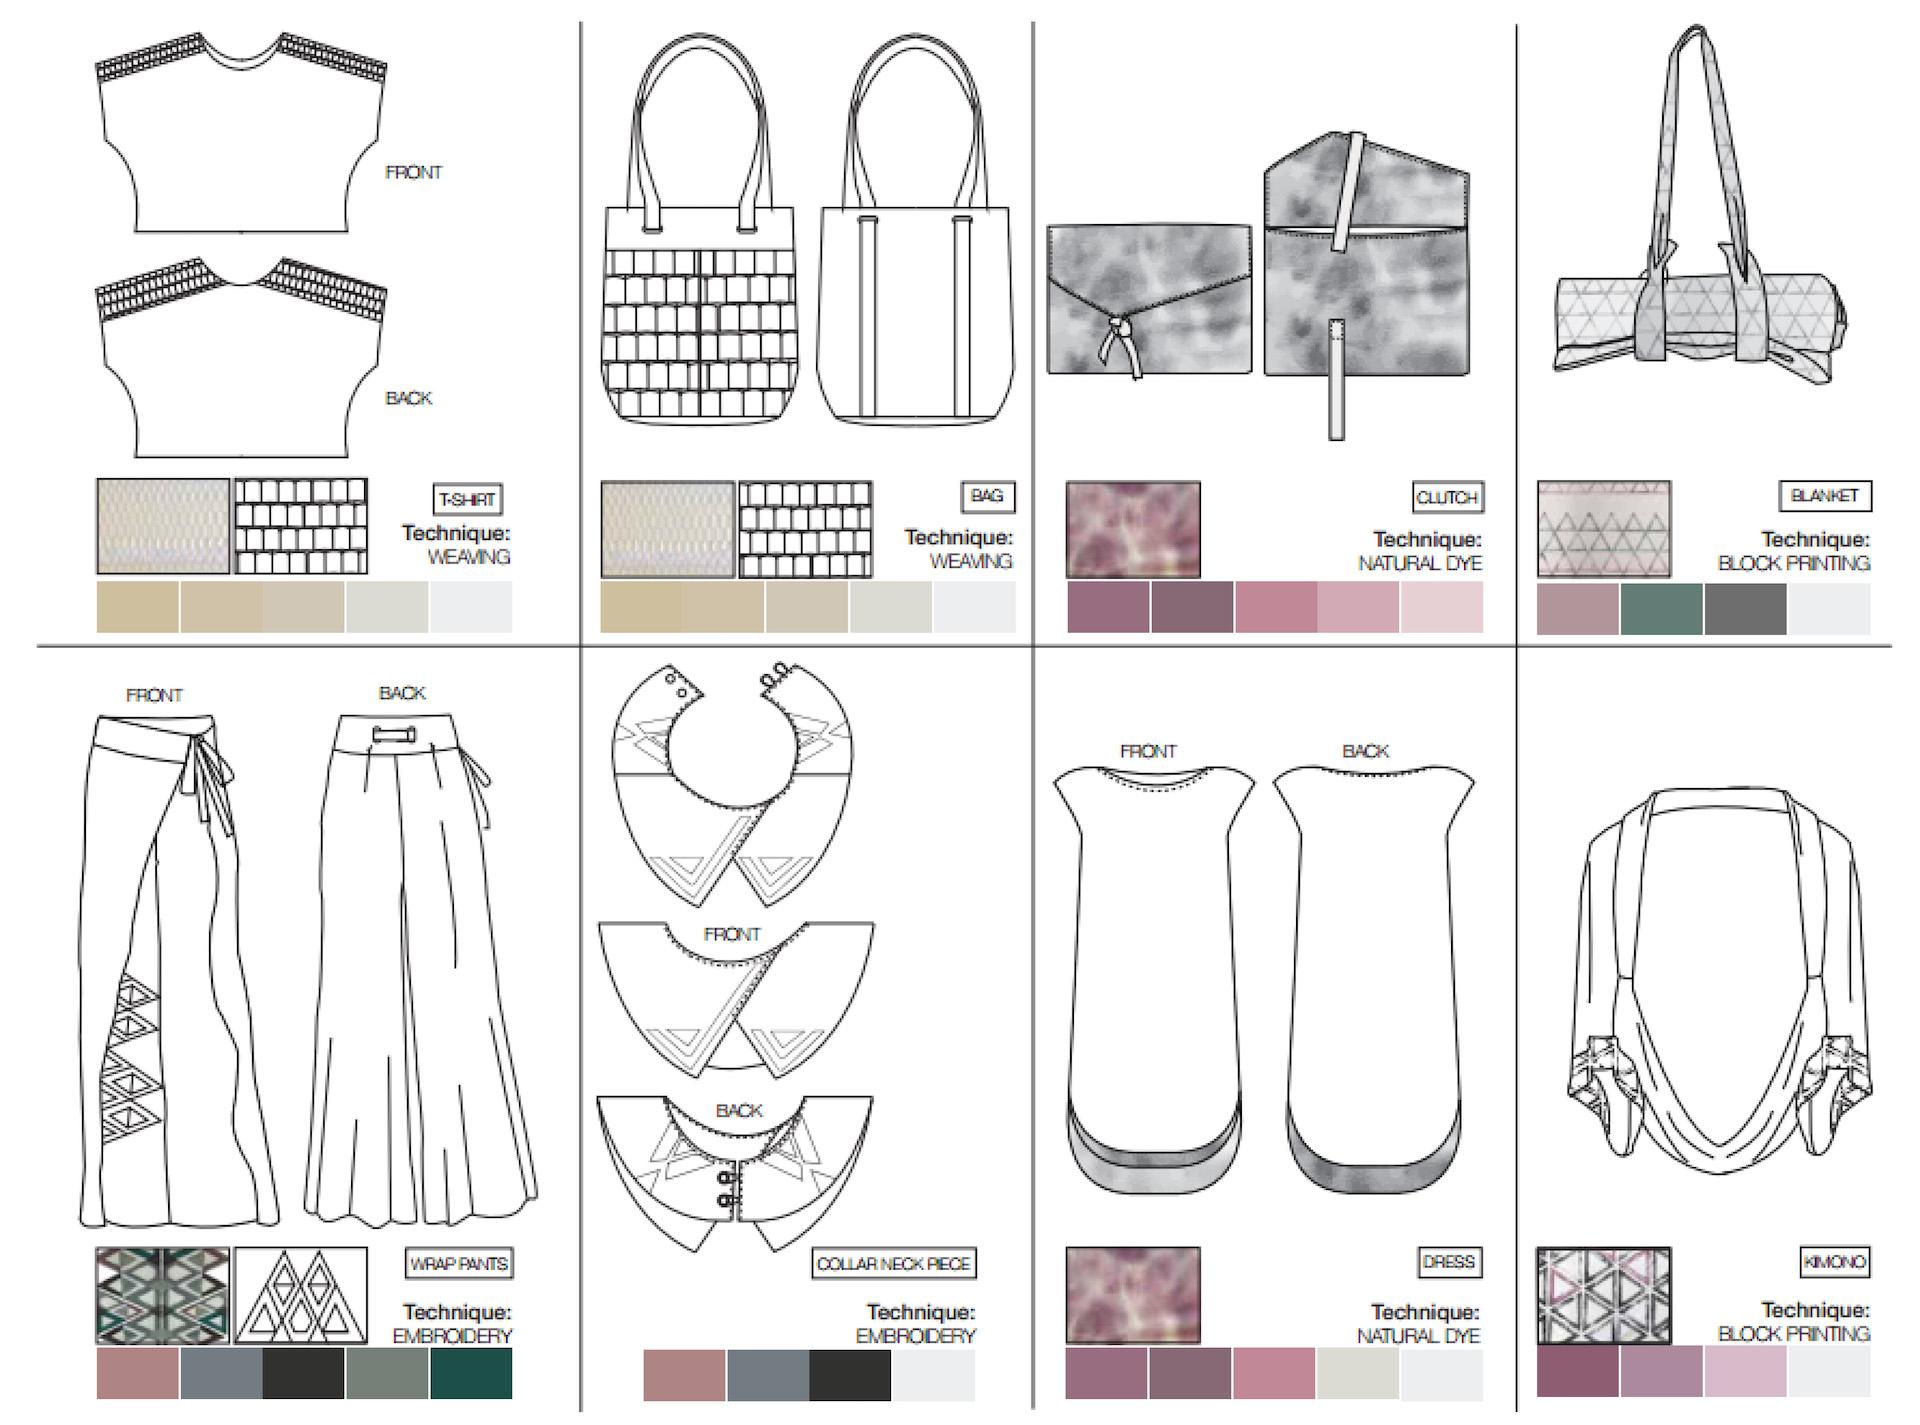 Flat drawings של כל הקולקציה, 2018. עיצוב: דניאל קלר אבירם